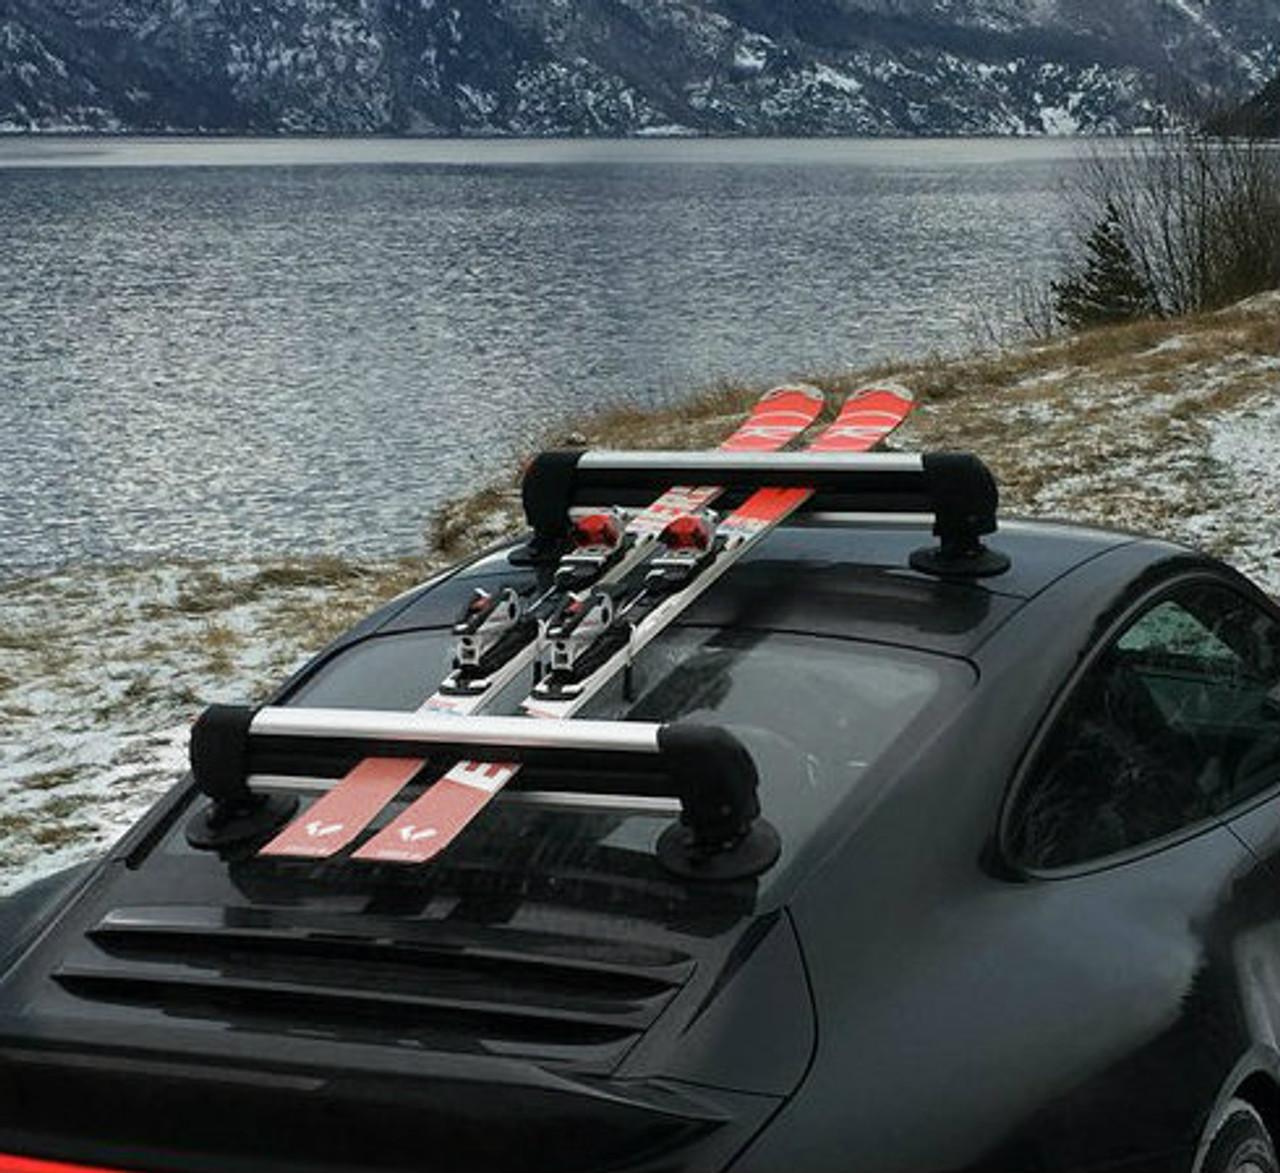 suction mount ski rack